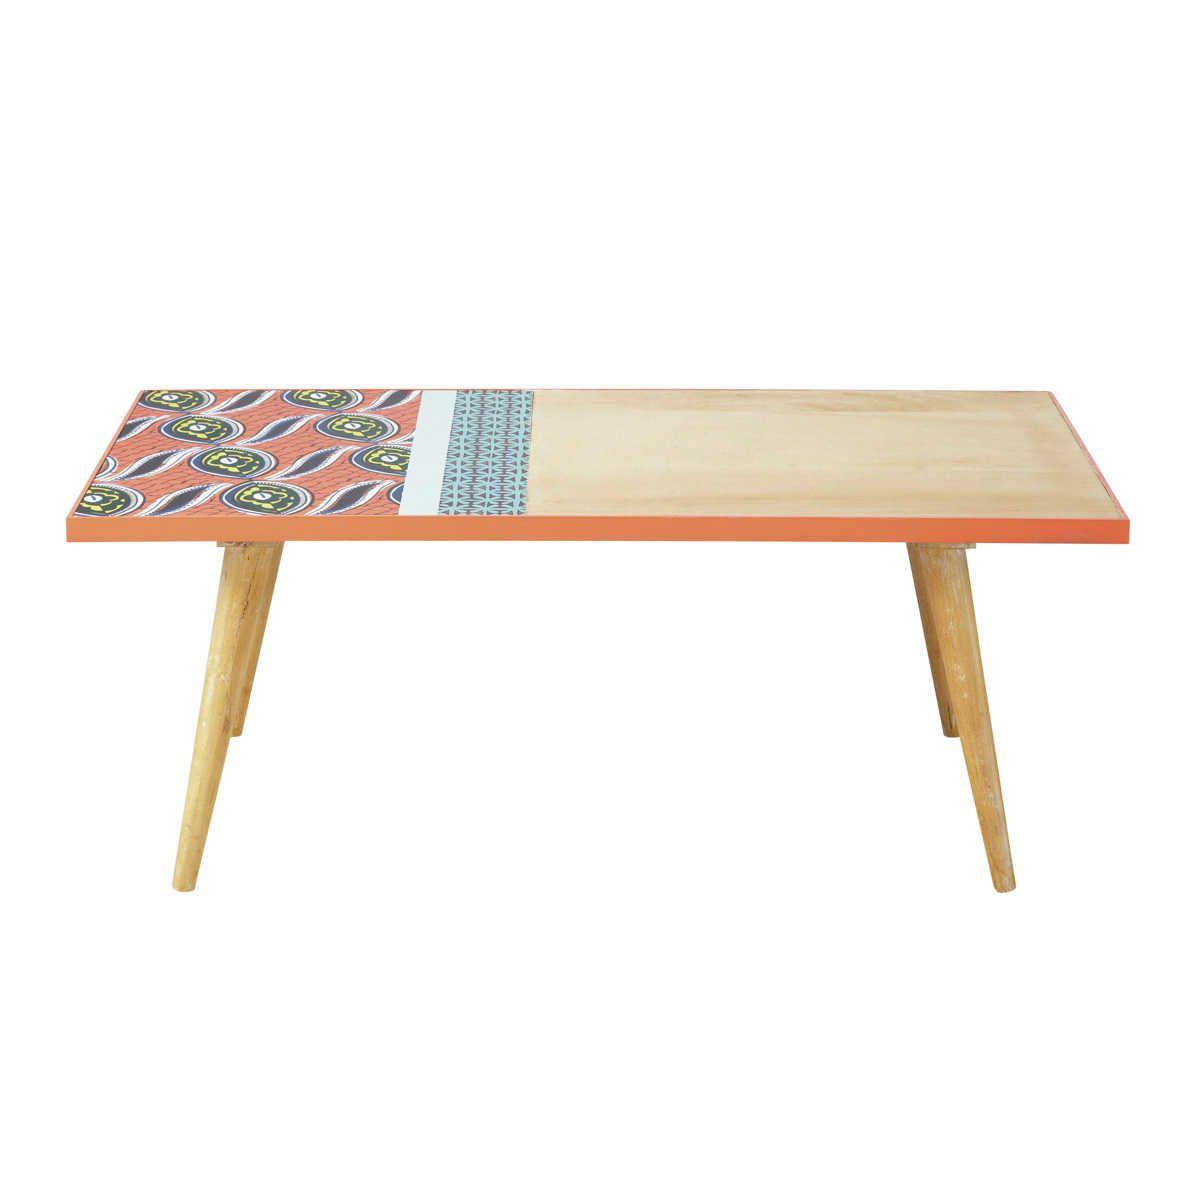 Table Basse Ronde En Manguier Sculpte Abenaki Table Basse Ronde Table Basse Table Basse Ronde Bois